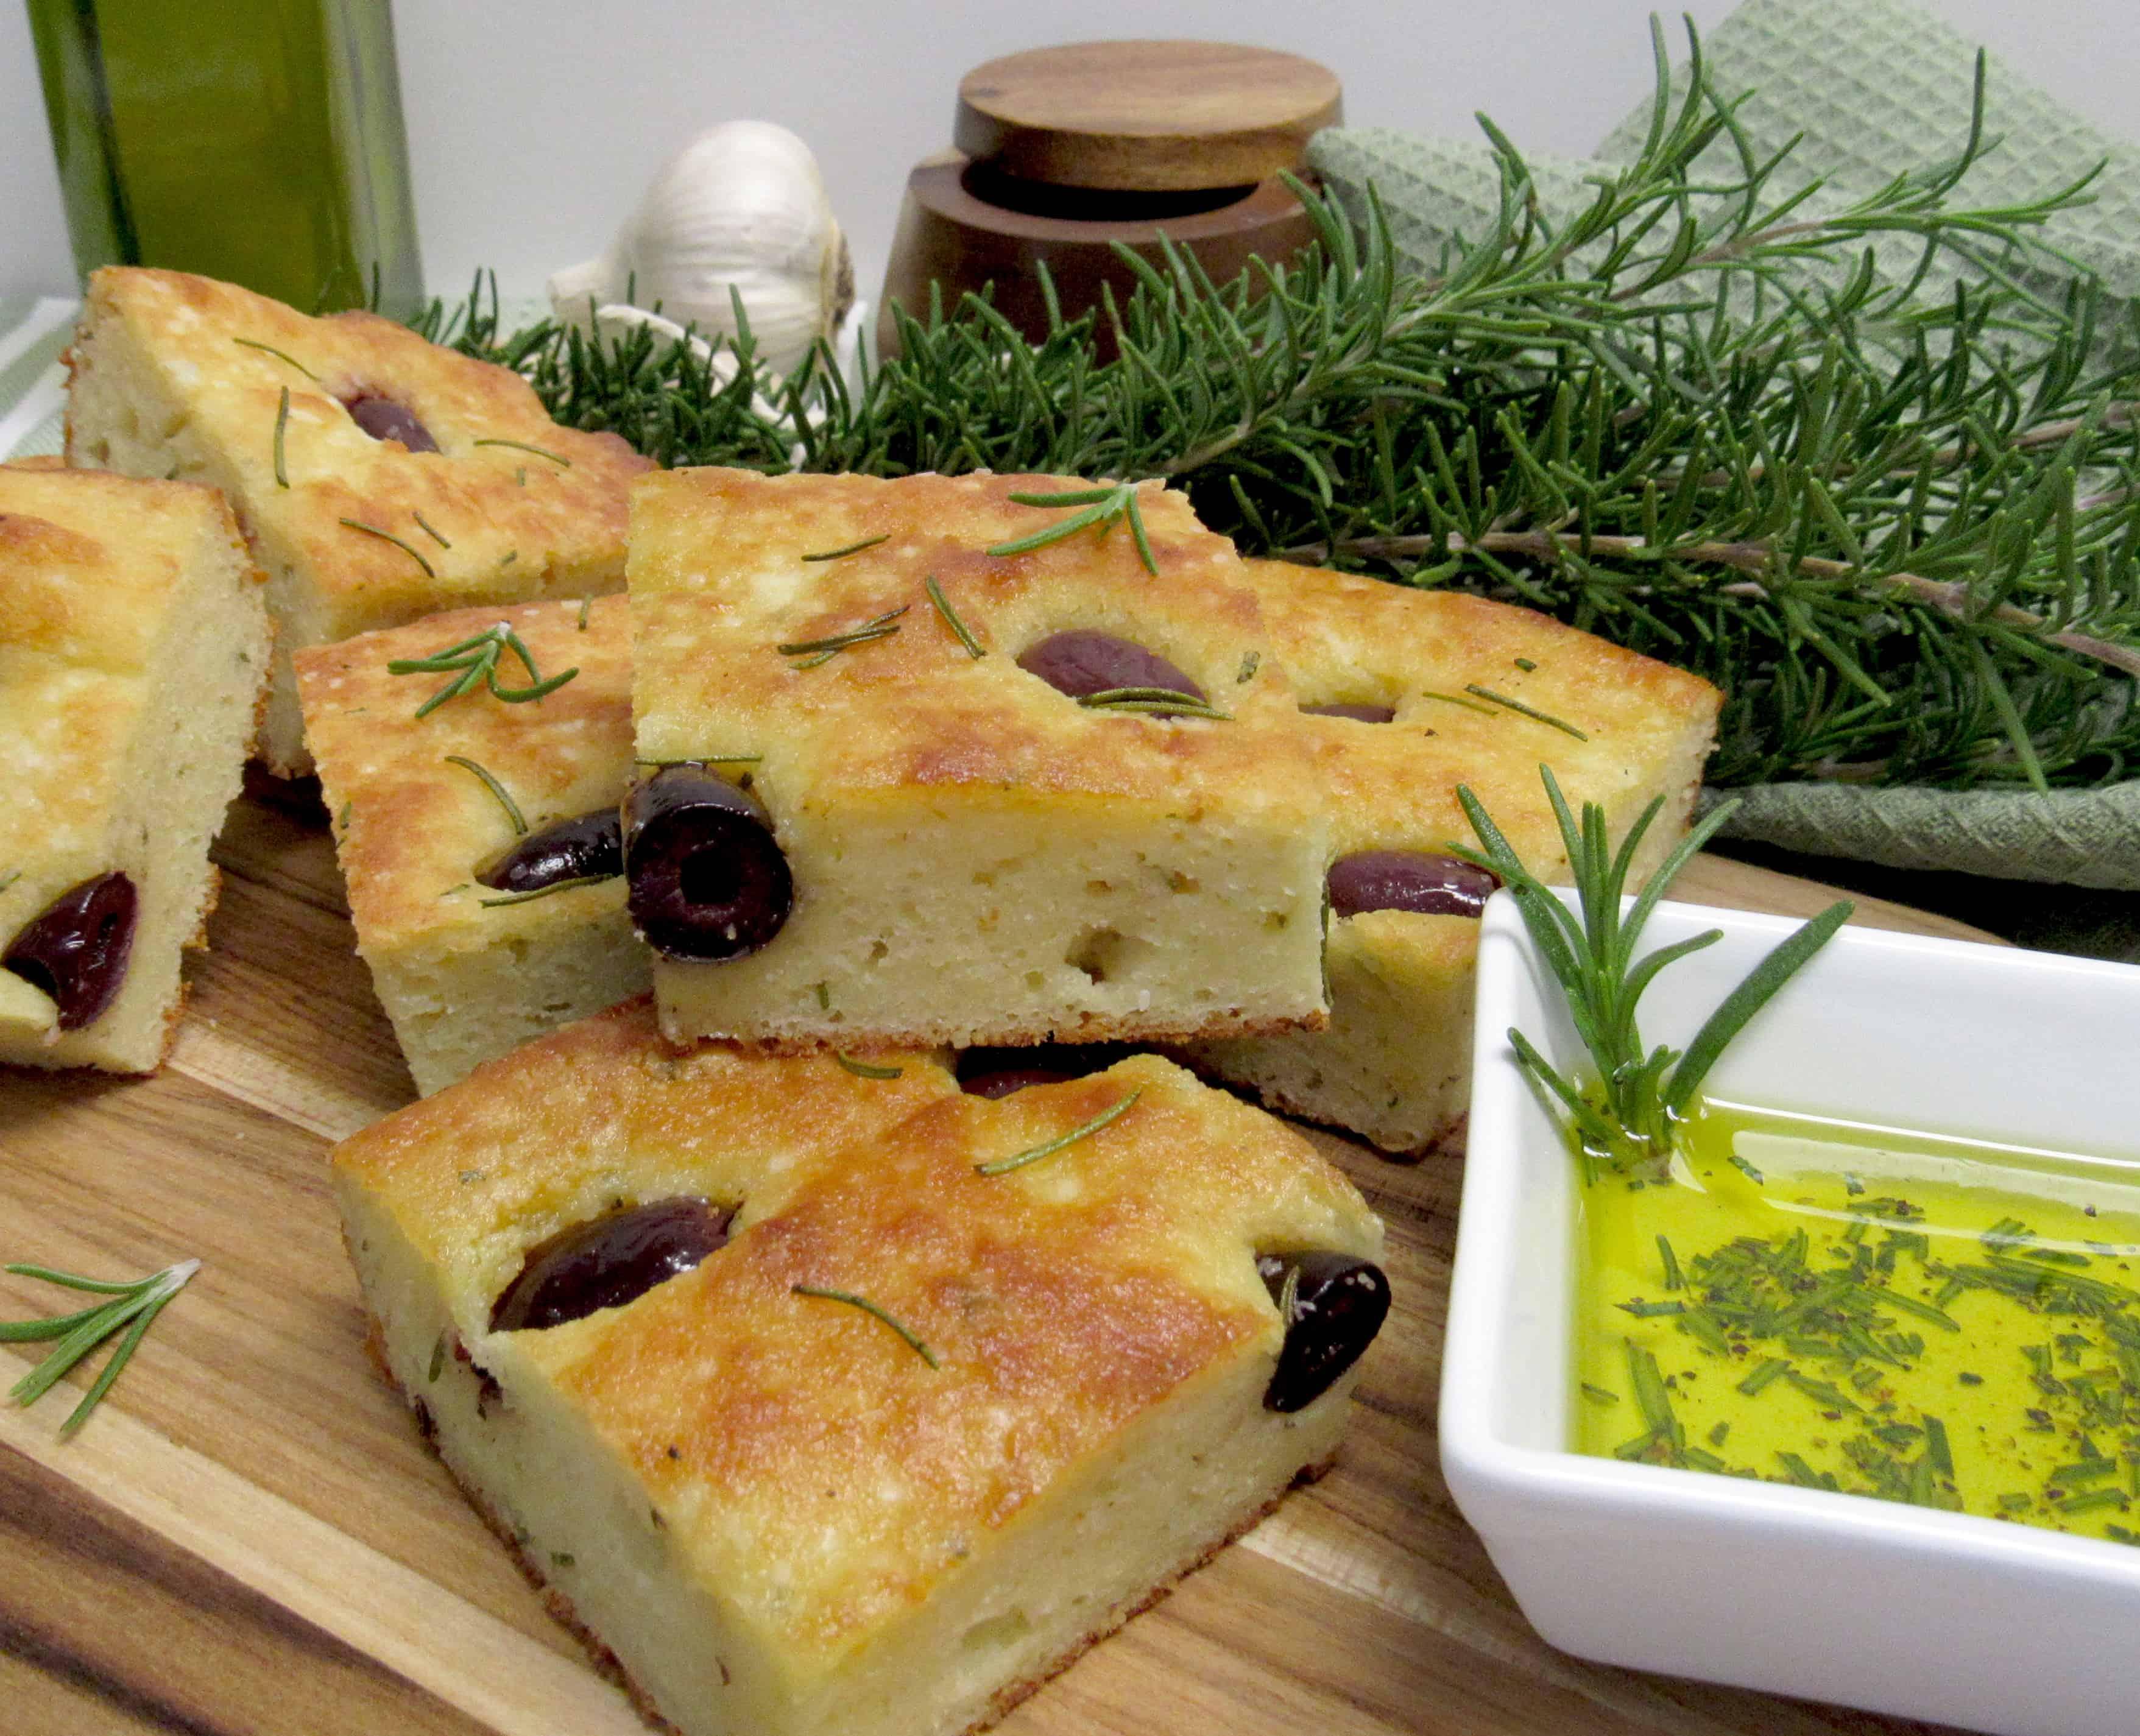 Rosemary and Kalamata Olive Focaccia - Keto, Low Carb & Gluten Free